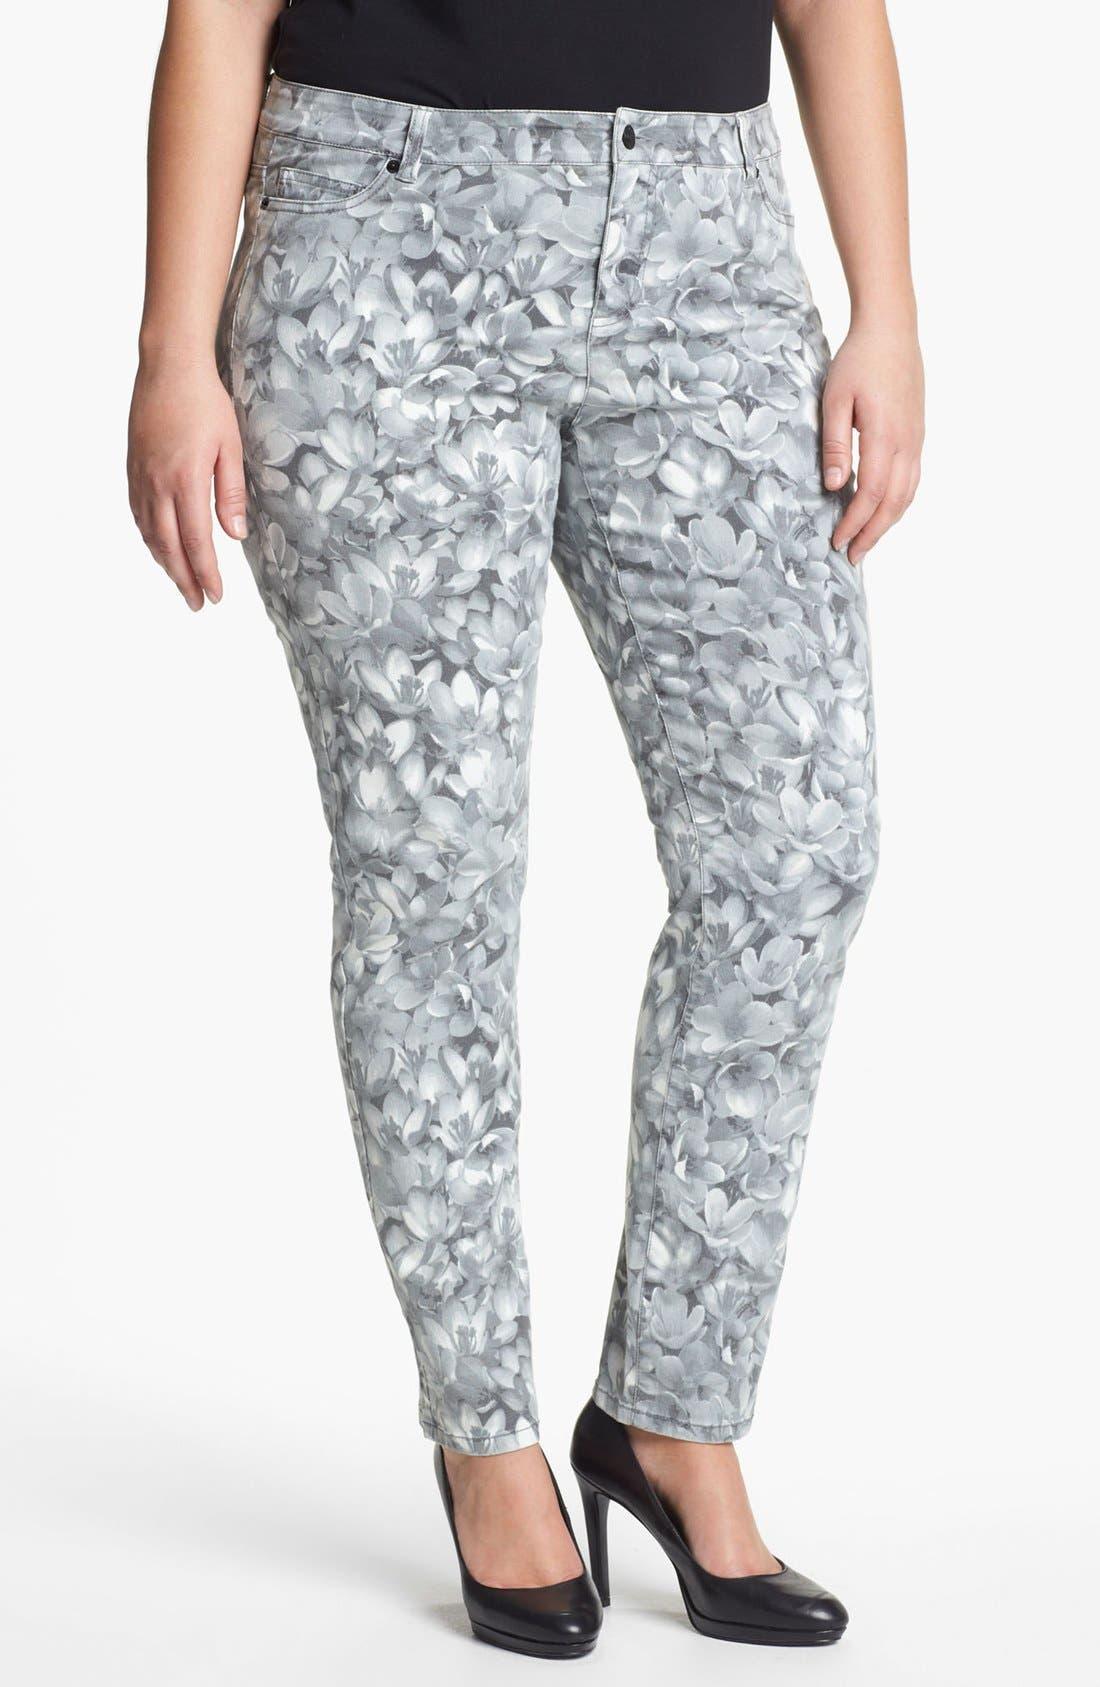 Alternate Image 1 Selected - MICHAEL Michael Kors 'Wildflower' Print Skinny Jeans (Plus)